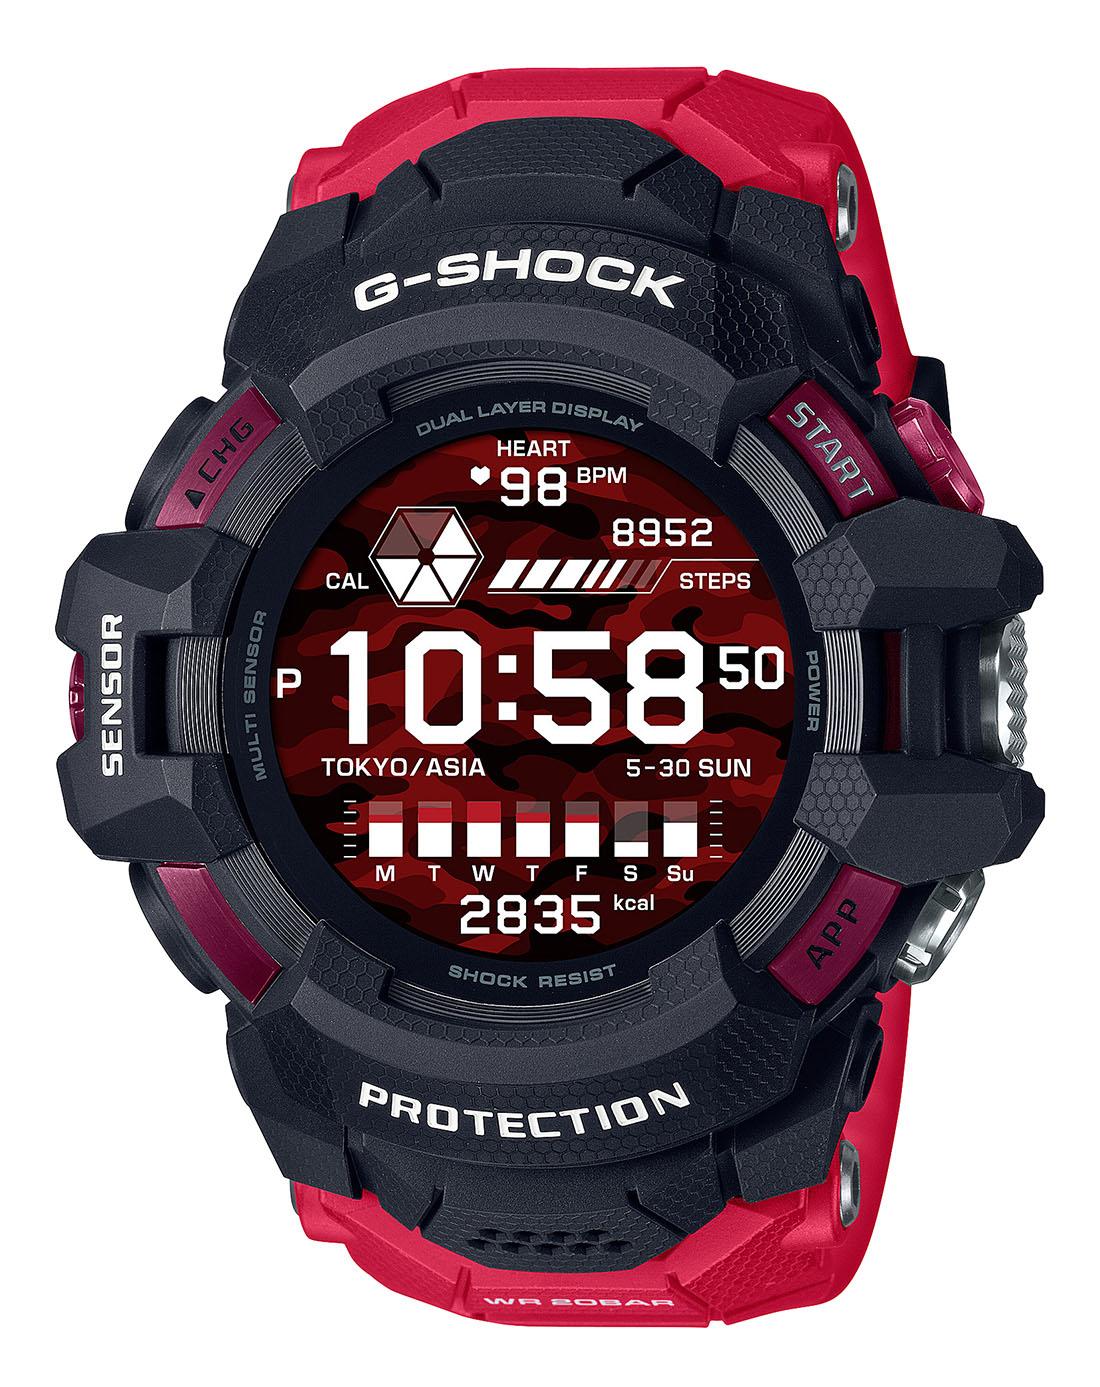 G-SHOCK G-SQUAD PRO GSW-H1000